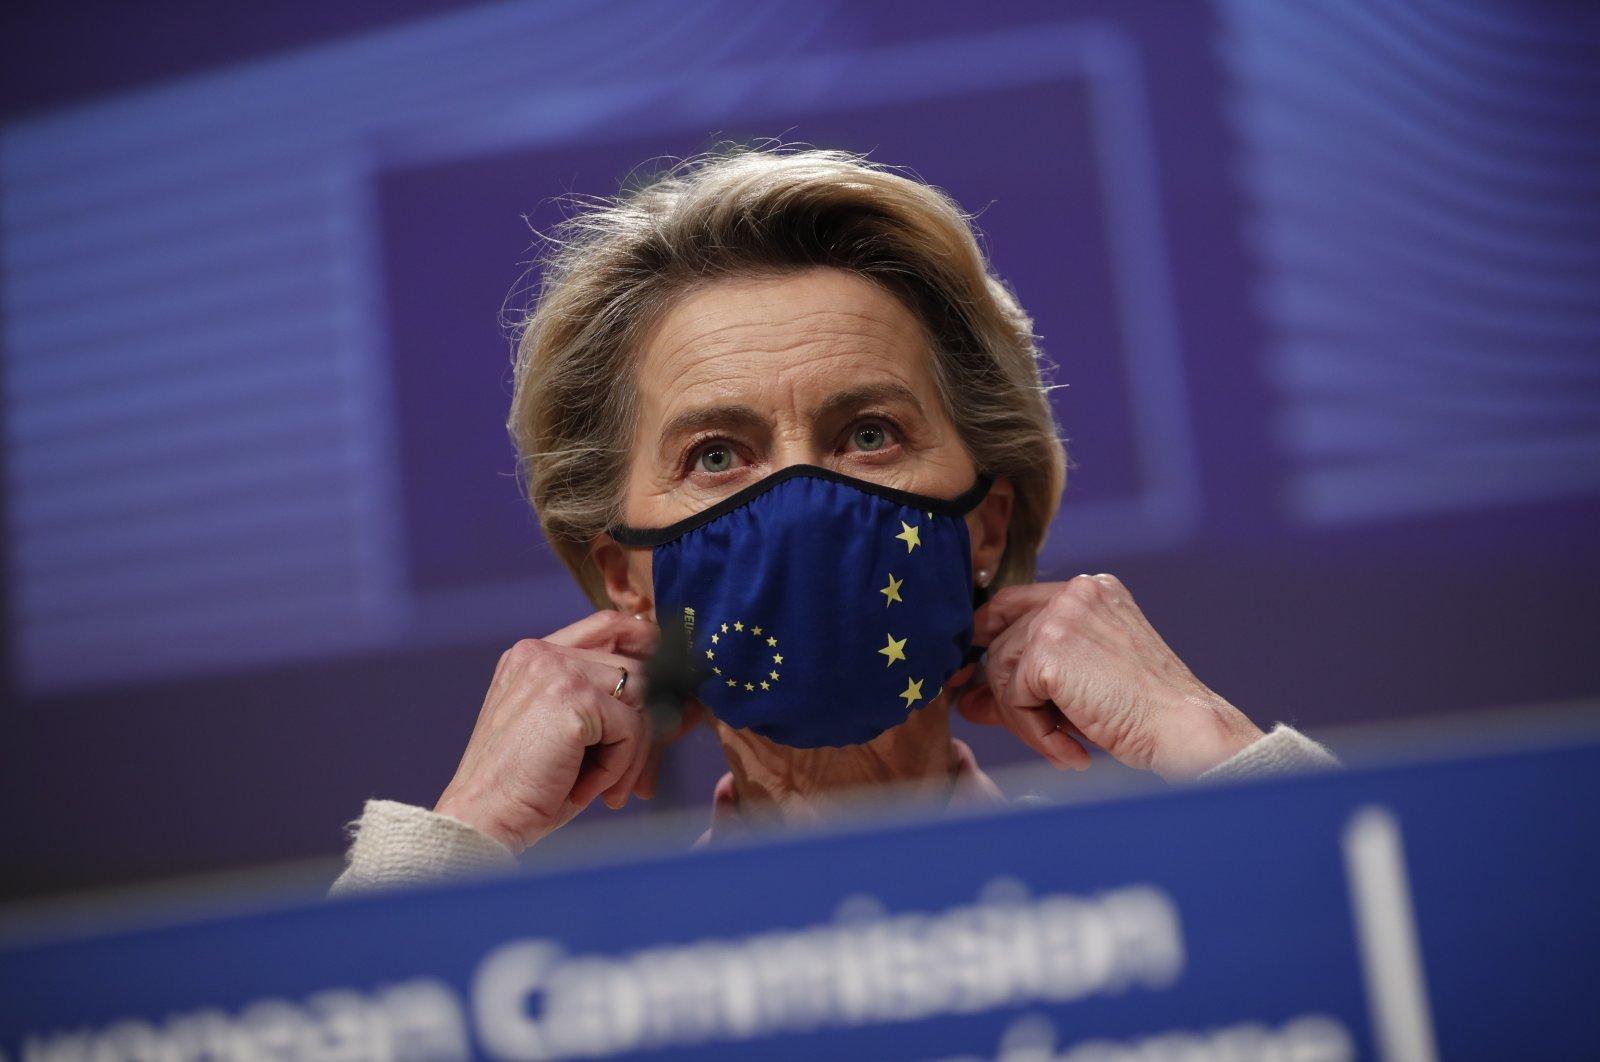 European Commission President Ursula von der Leyen prepares to address a media conference at EU headquarters in Brussels, Dec. 24, 2020. (AP Photo)